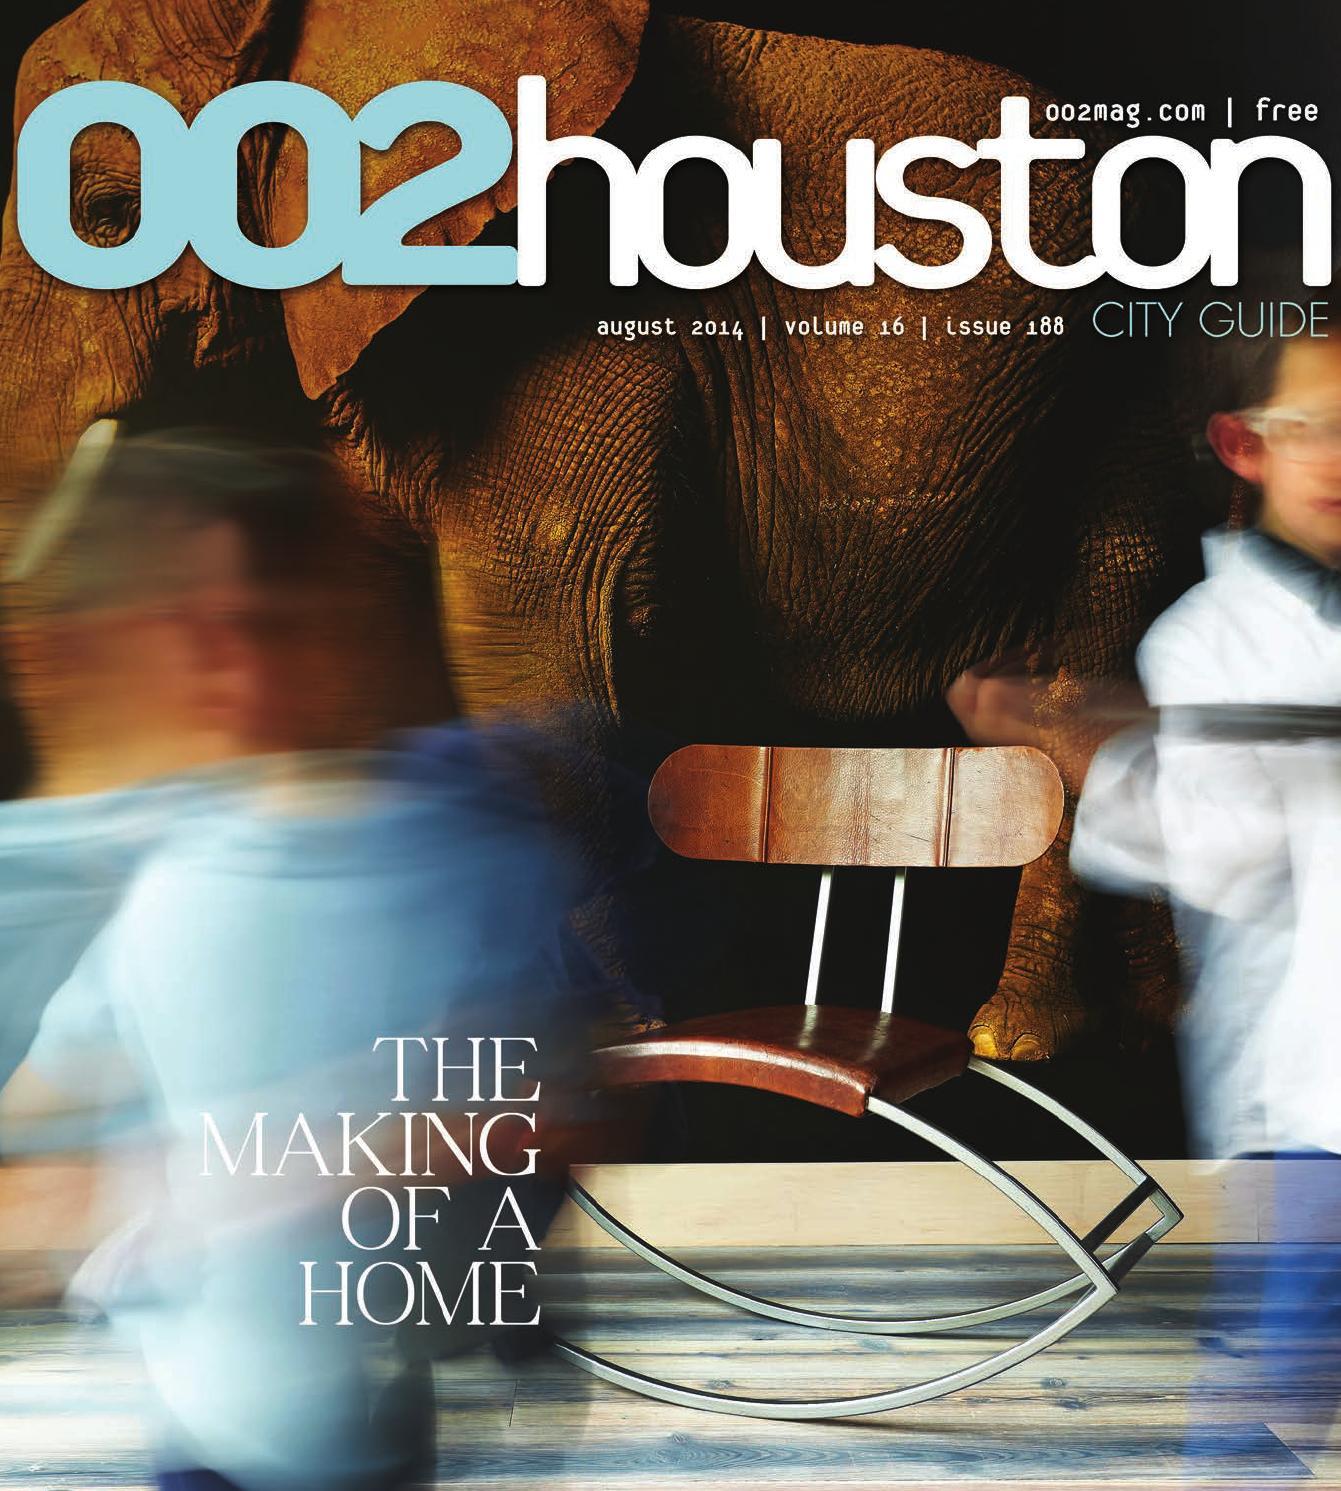 August 2014 by 002houston magazine - issuu